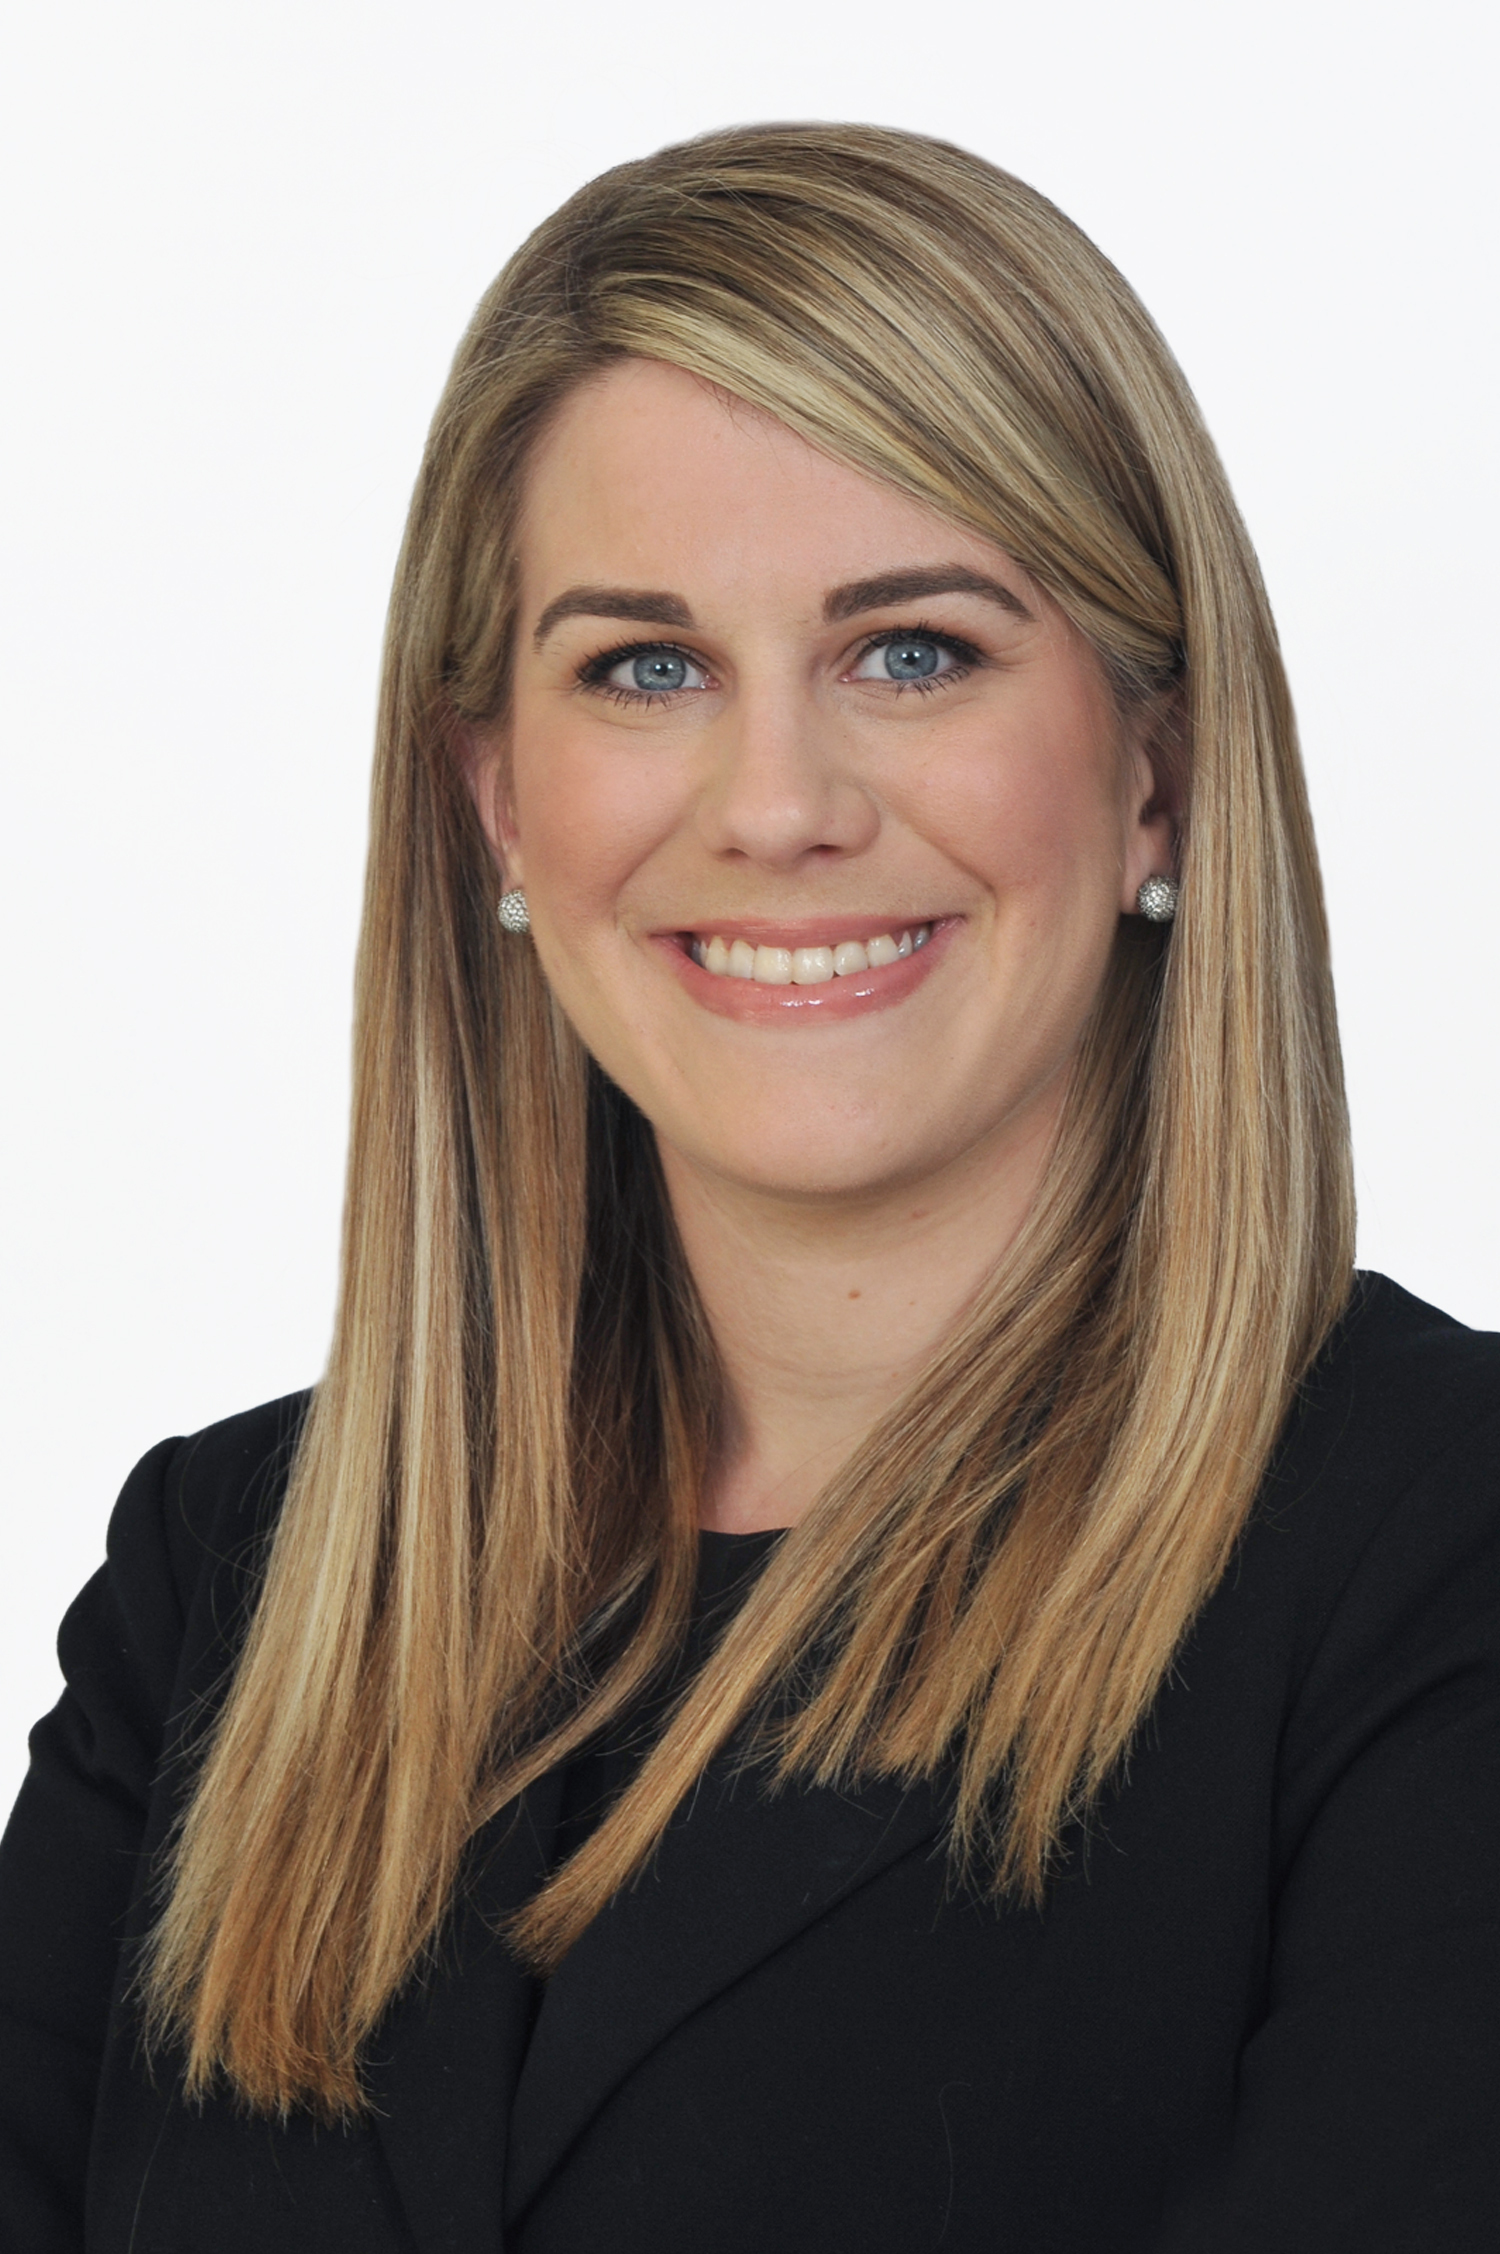 Sarah Robison